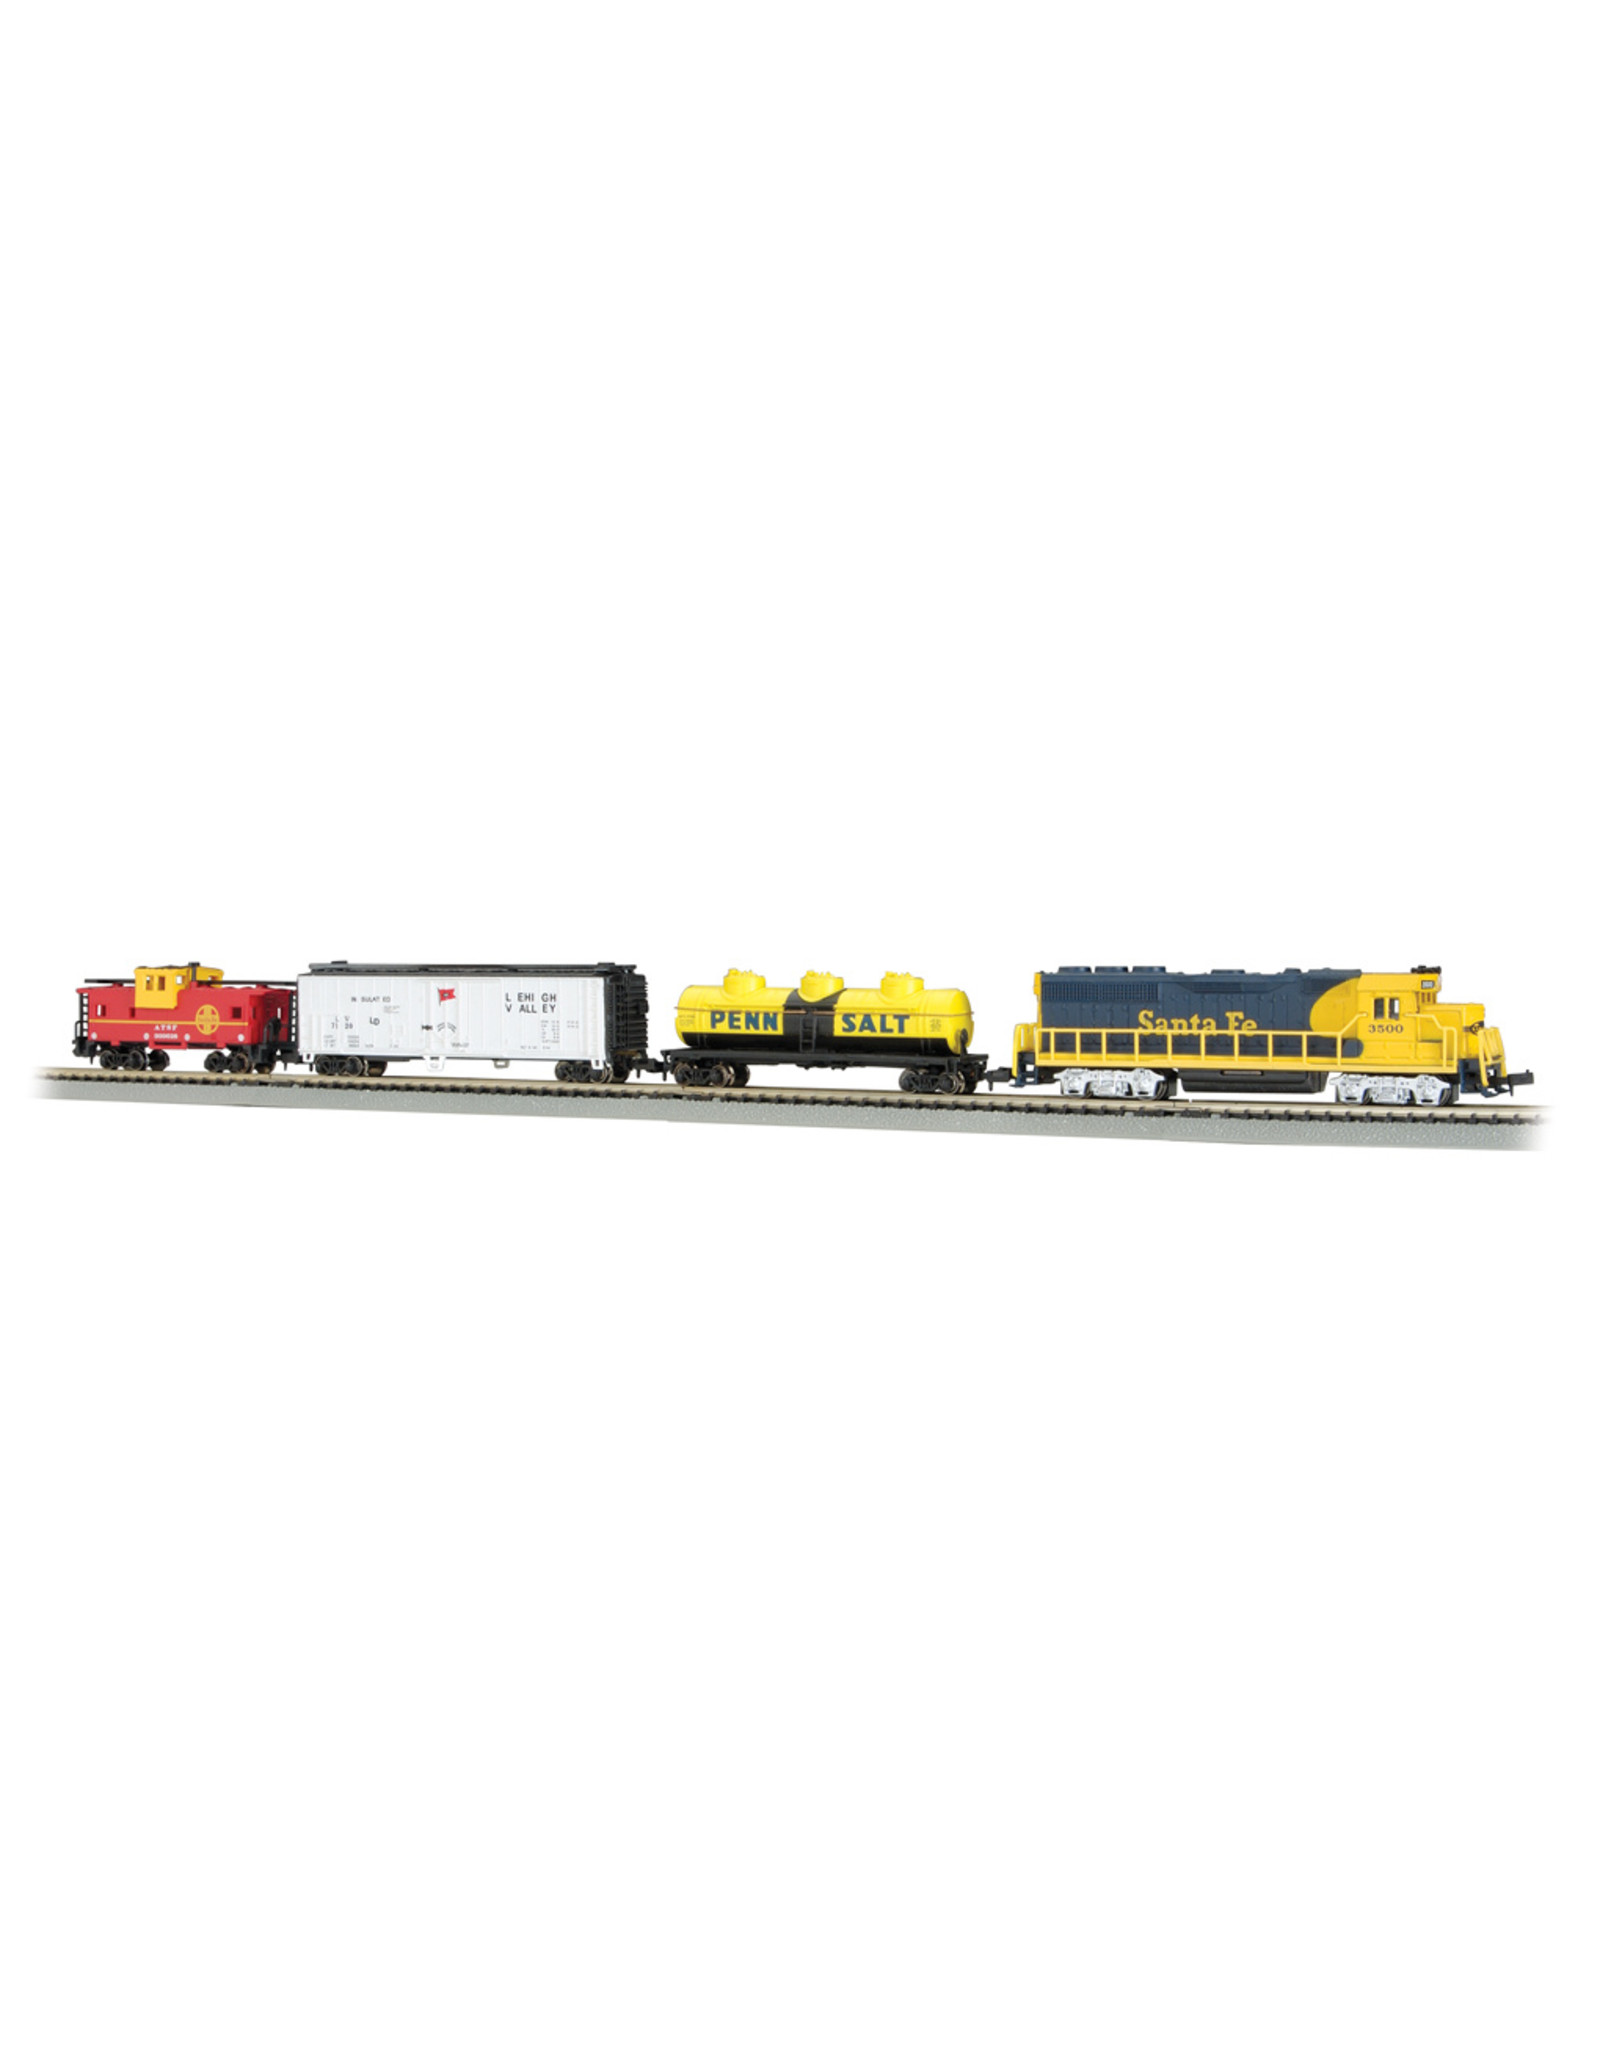 Bachmann Thunder Valley RTR N Scale Train Set